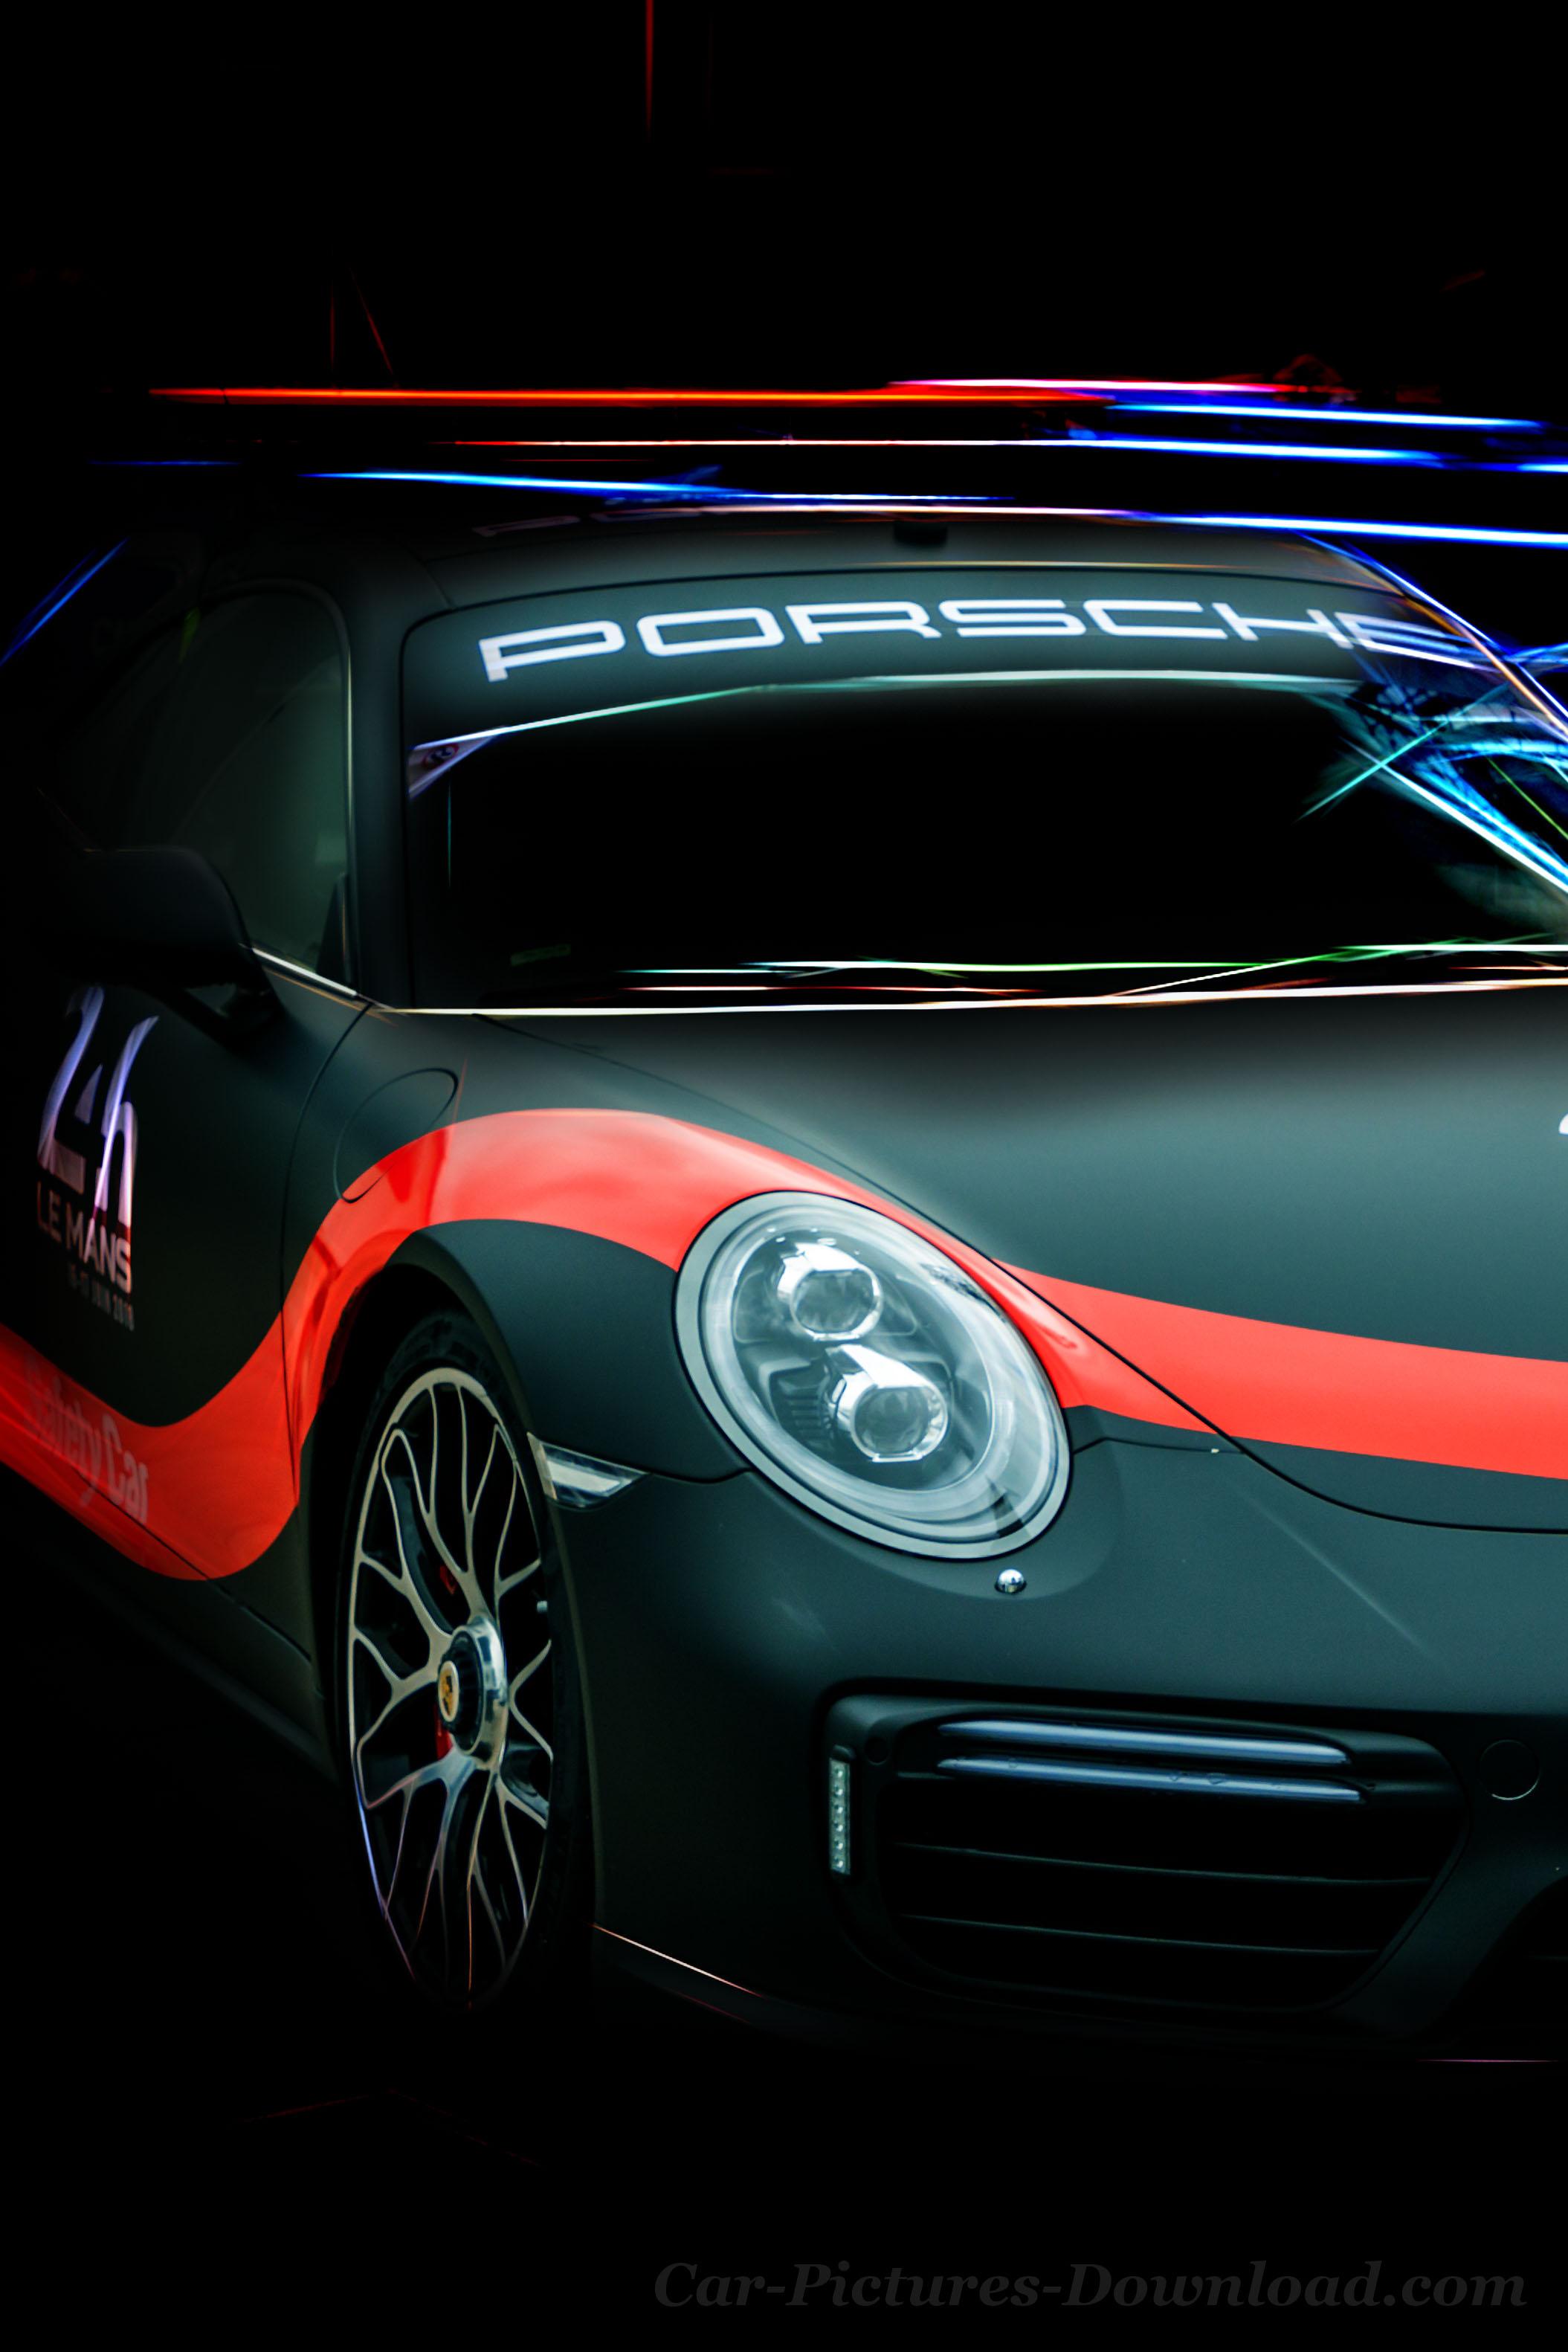 Porsche Wallpaper Images   4K Ultra HD Mobile PC   Download 2109x3163